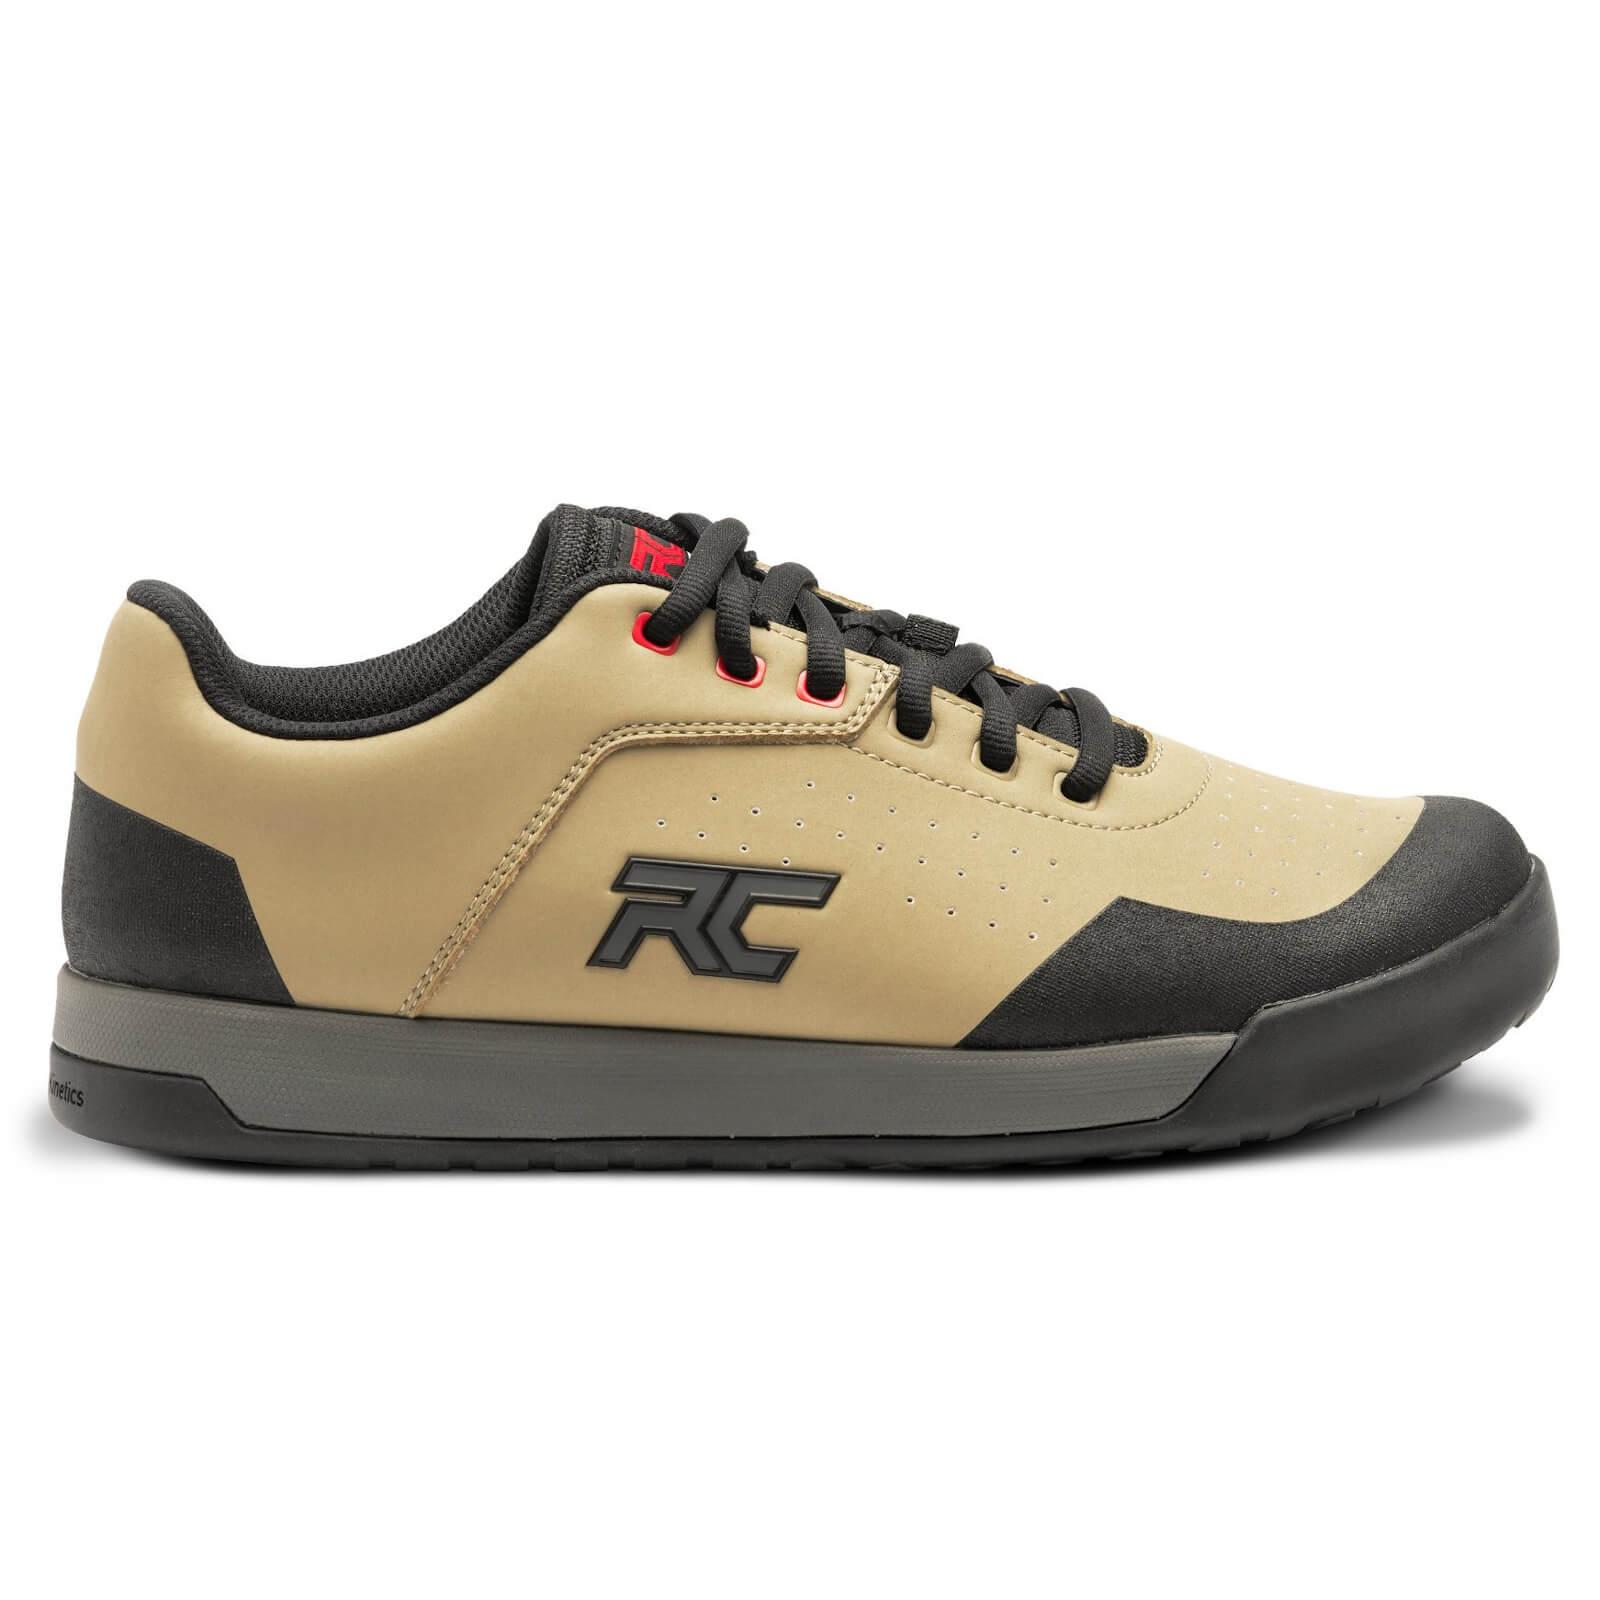 Ride Concepts Hellion Elite Flat MTB Shoes - UK 8/EU 42 - Khaki